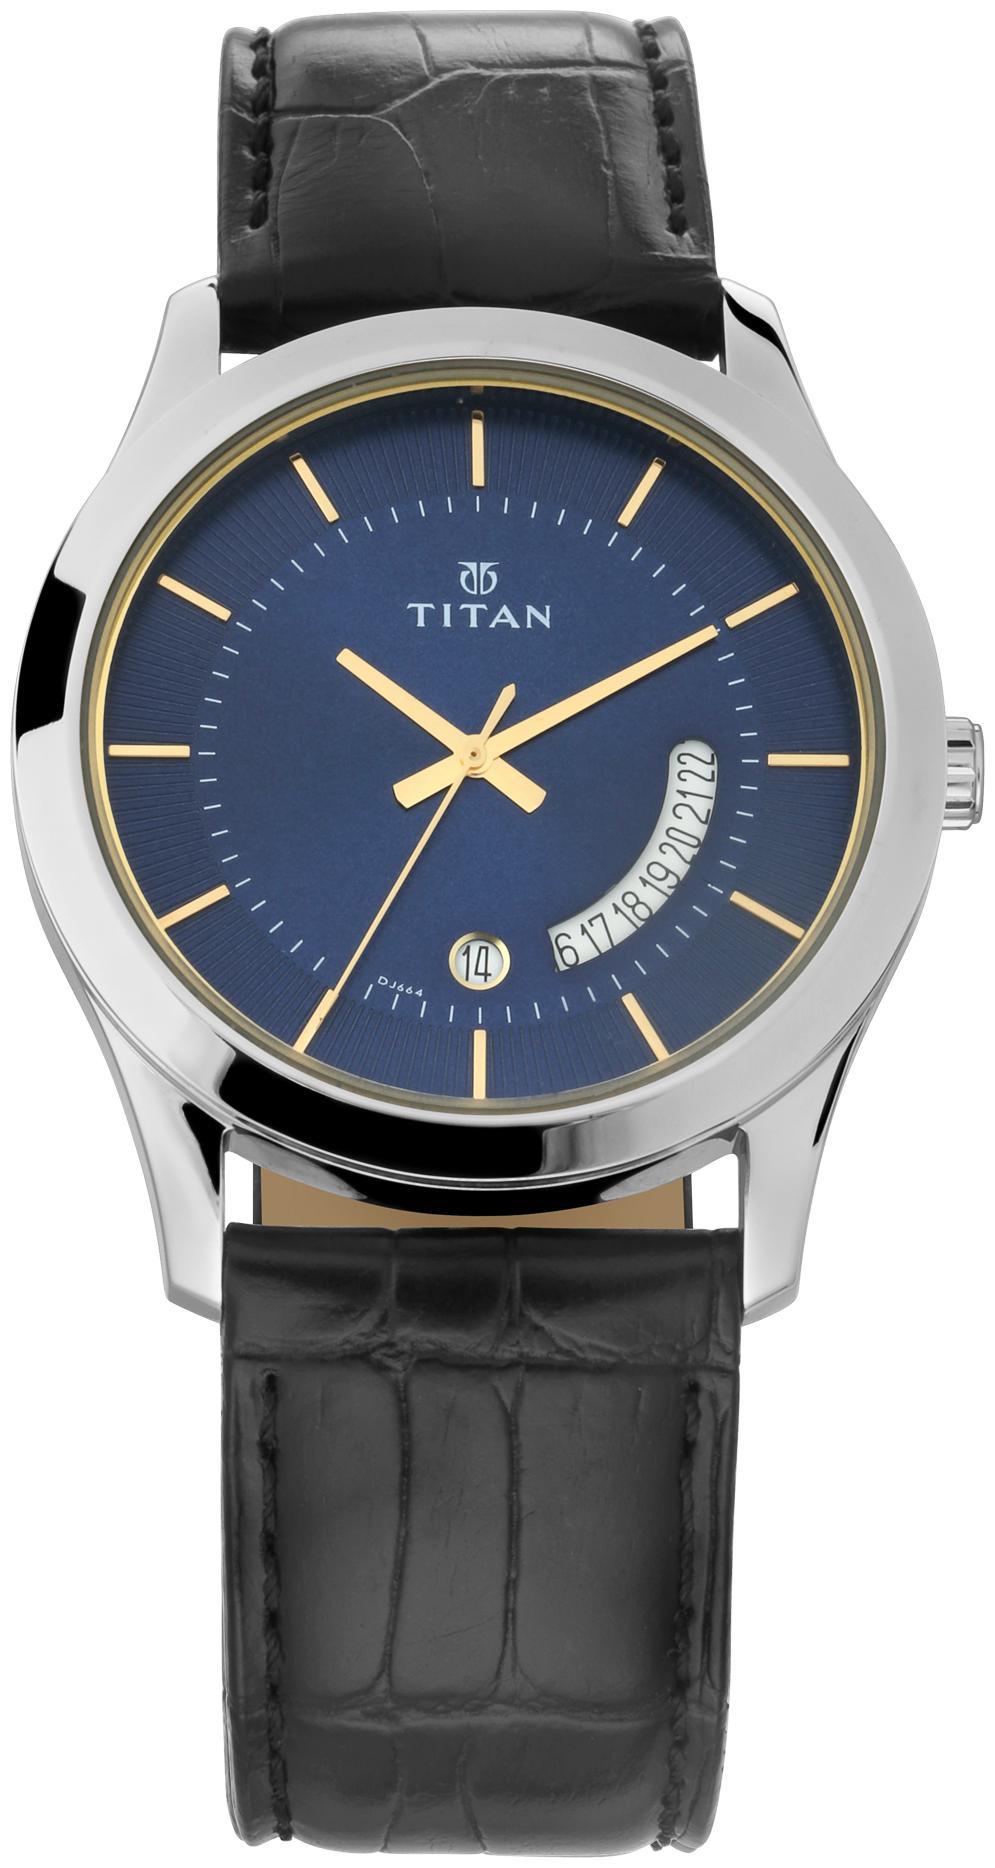 Titan Analog Watch For Men by Titan Company